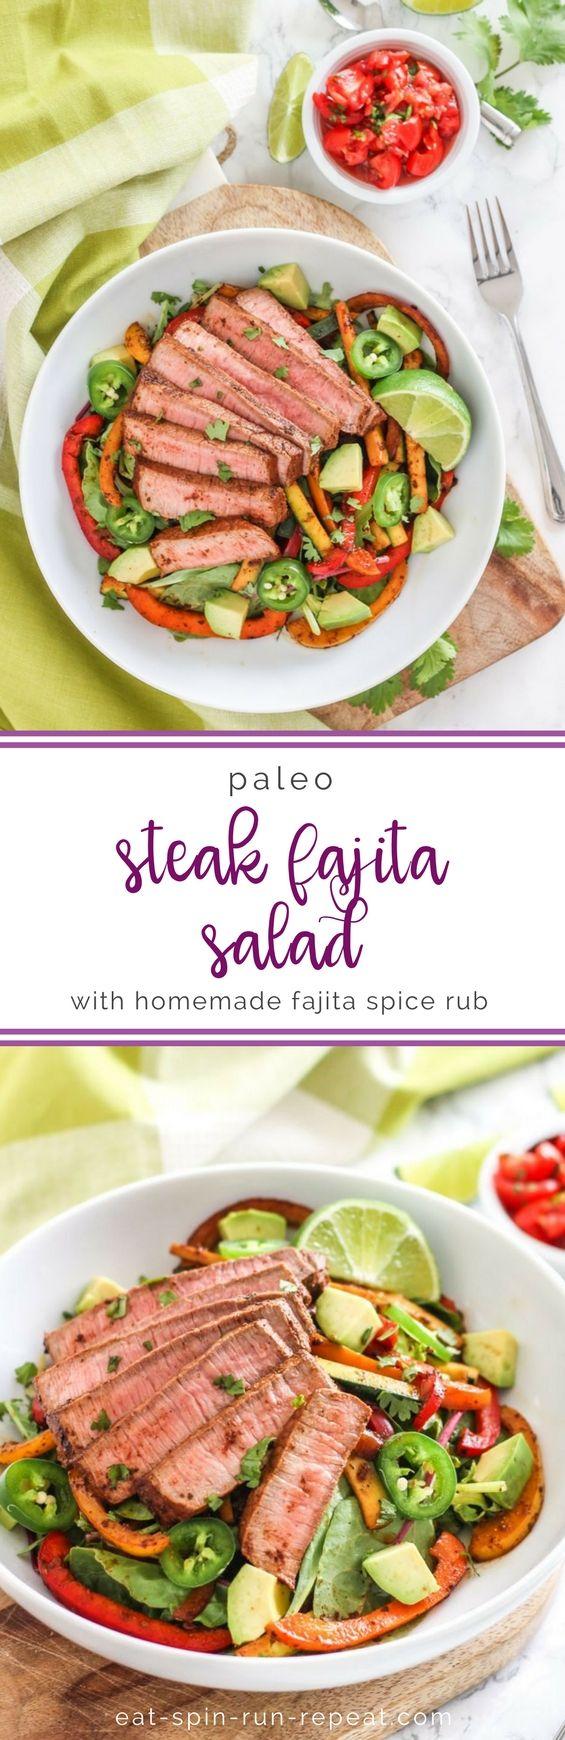 Paleo Steak Fajita Salad with Homemade Fajita Spice Rub || Eat Spin Run Repeat